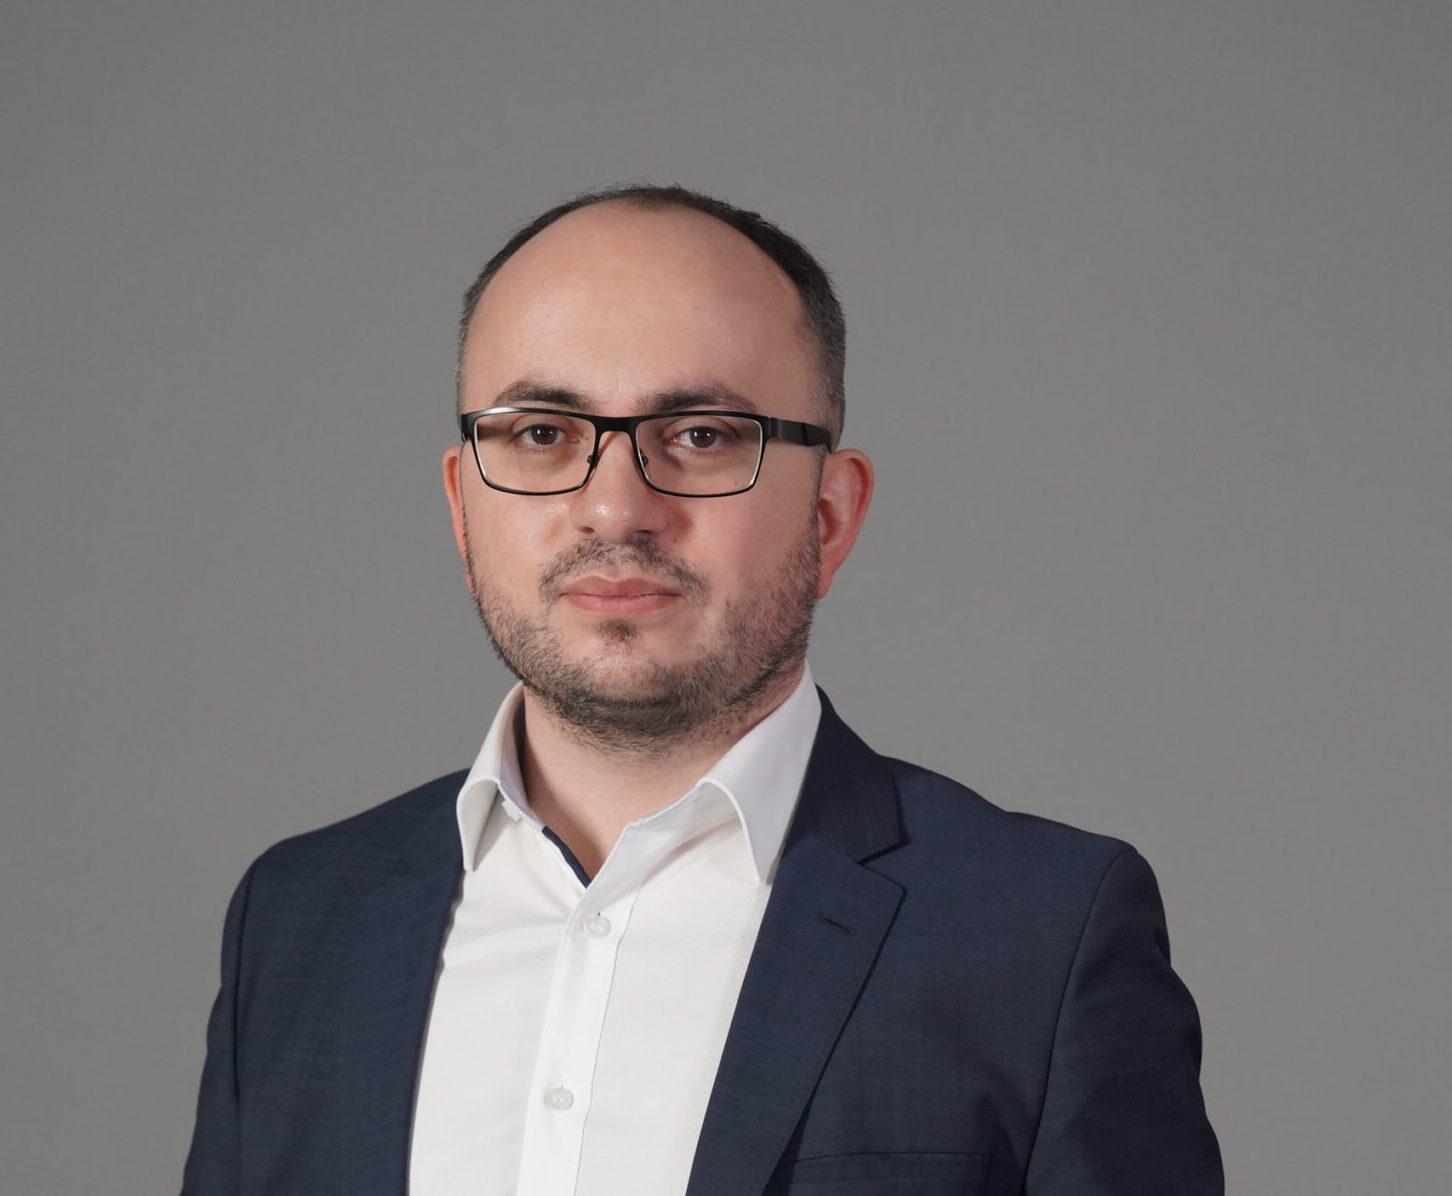 Смбат Саакян